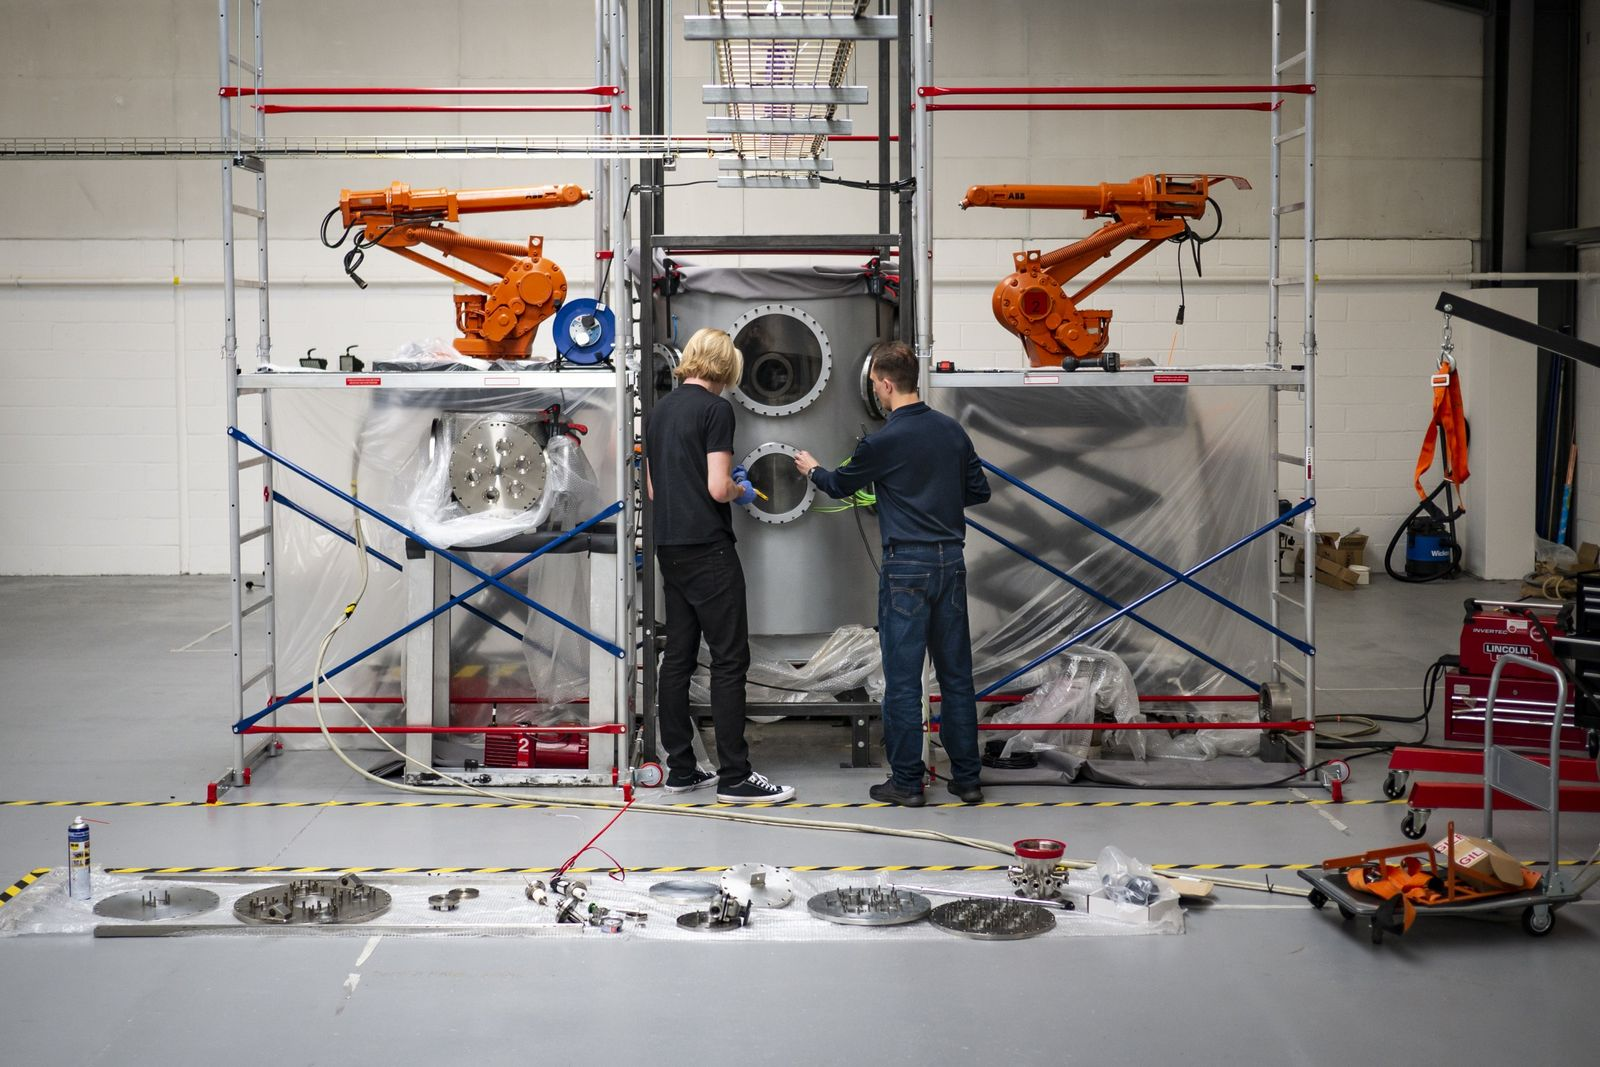 Richard Dinan and James Lambert working on the Pulsar Fusion reactor, July 2019.